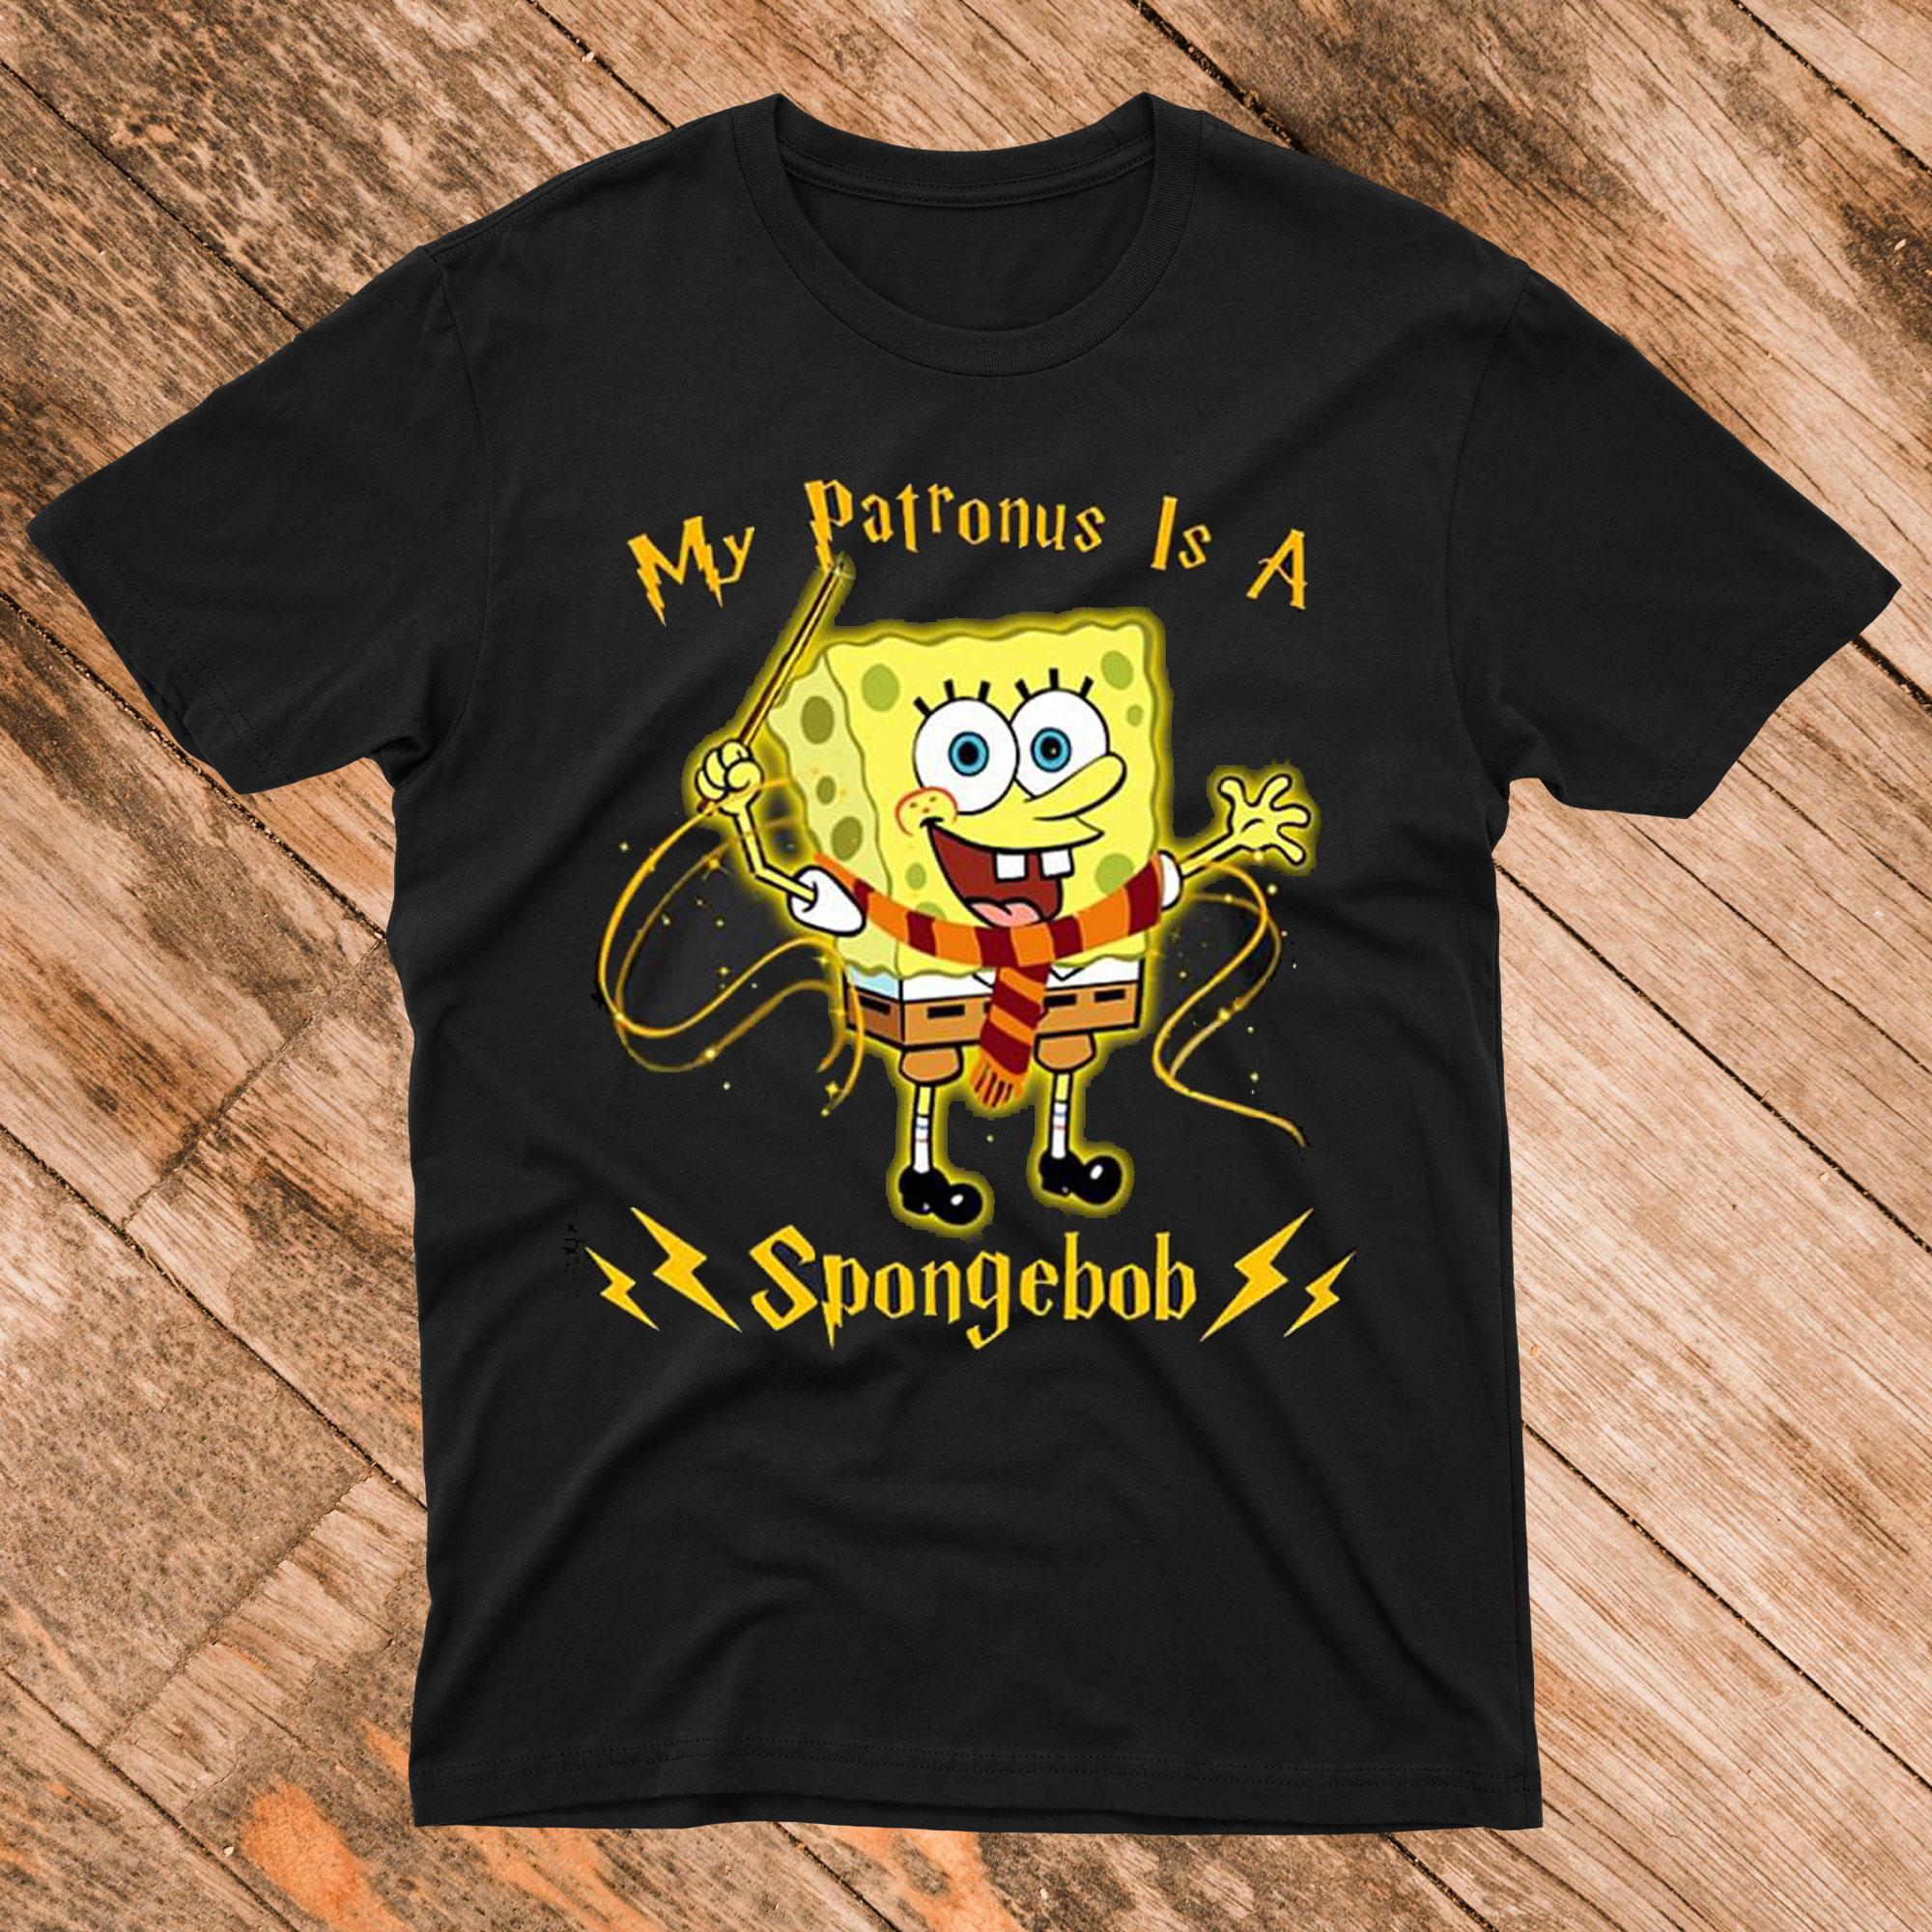 My Patronus Is A Spongebob T shirt